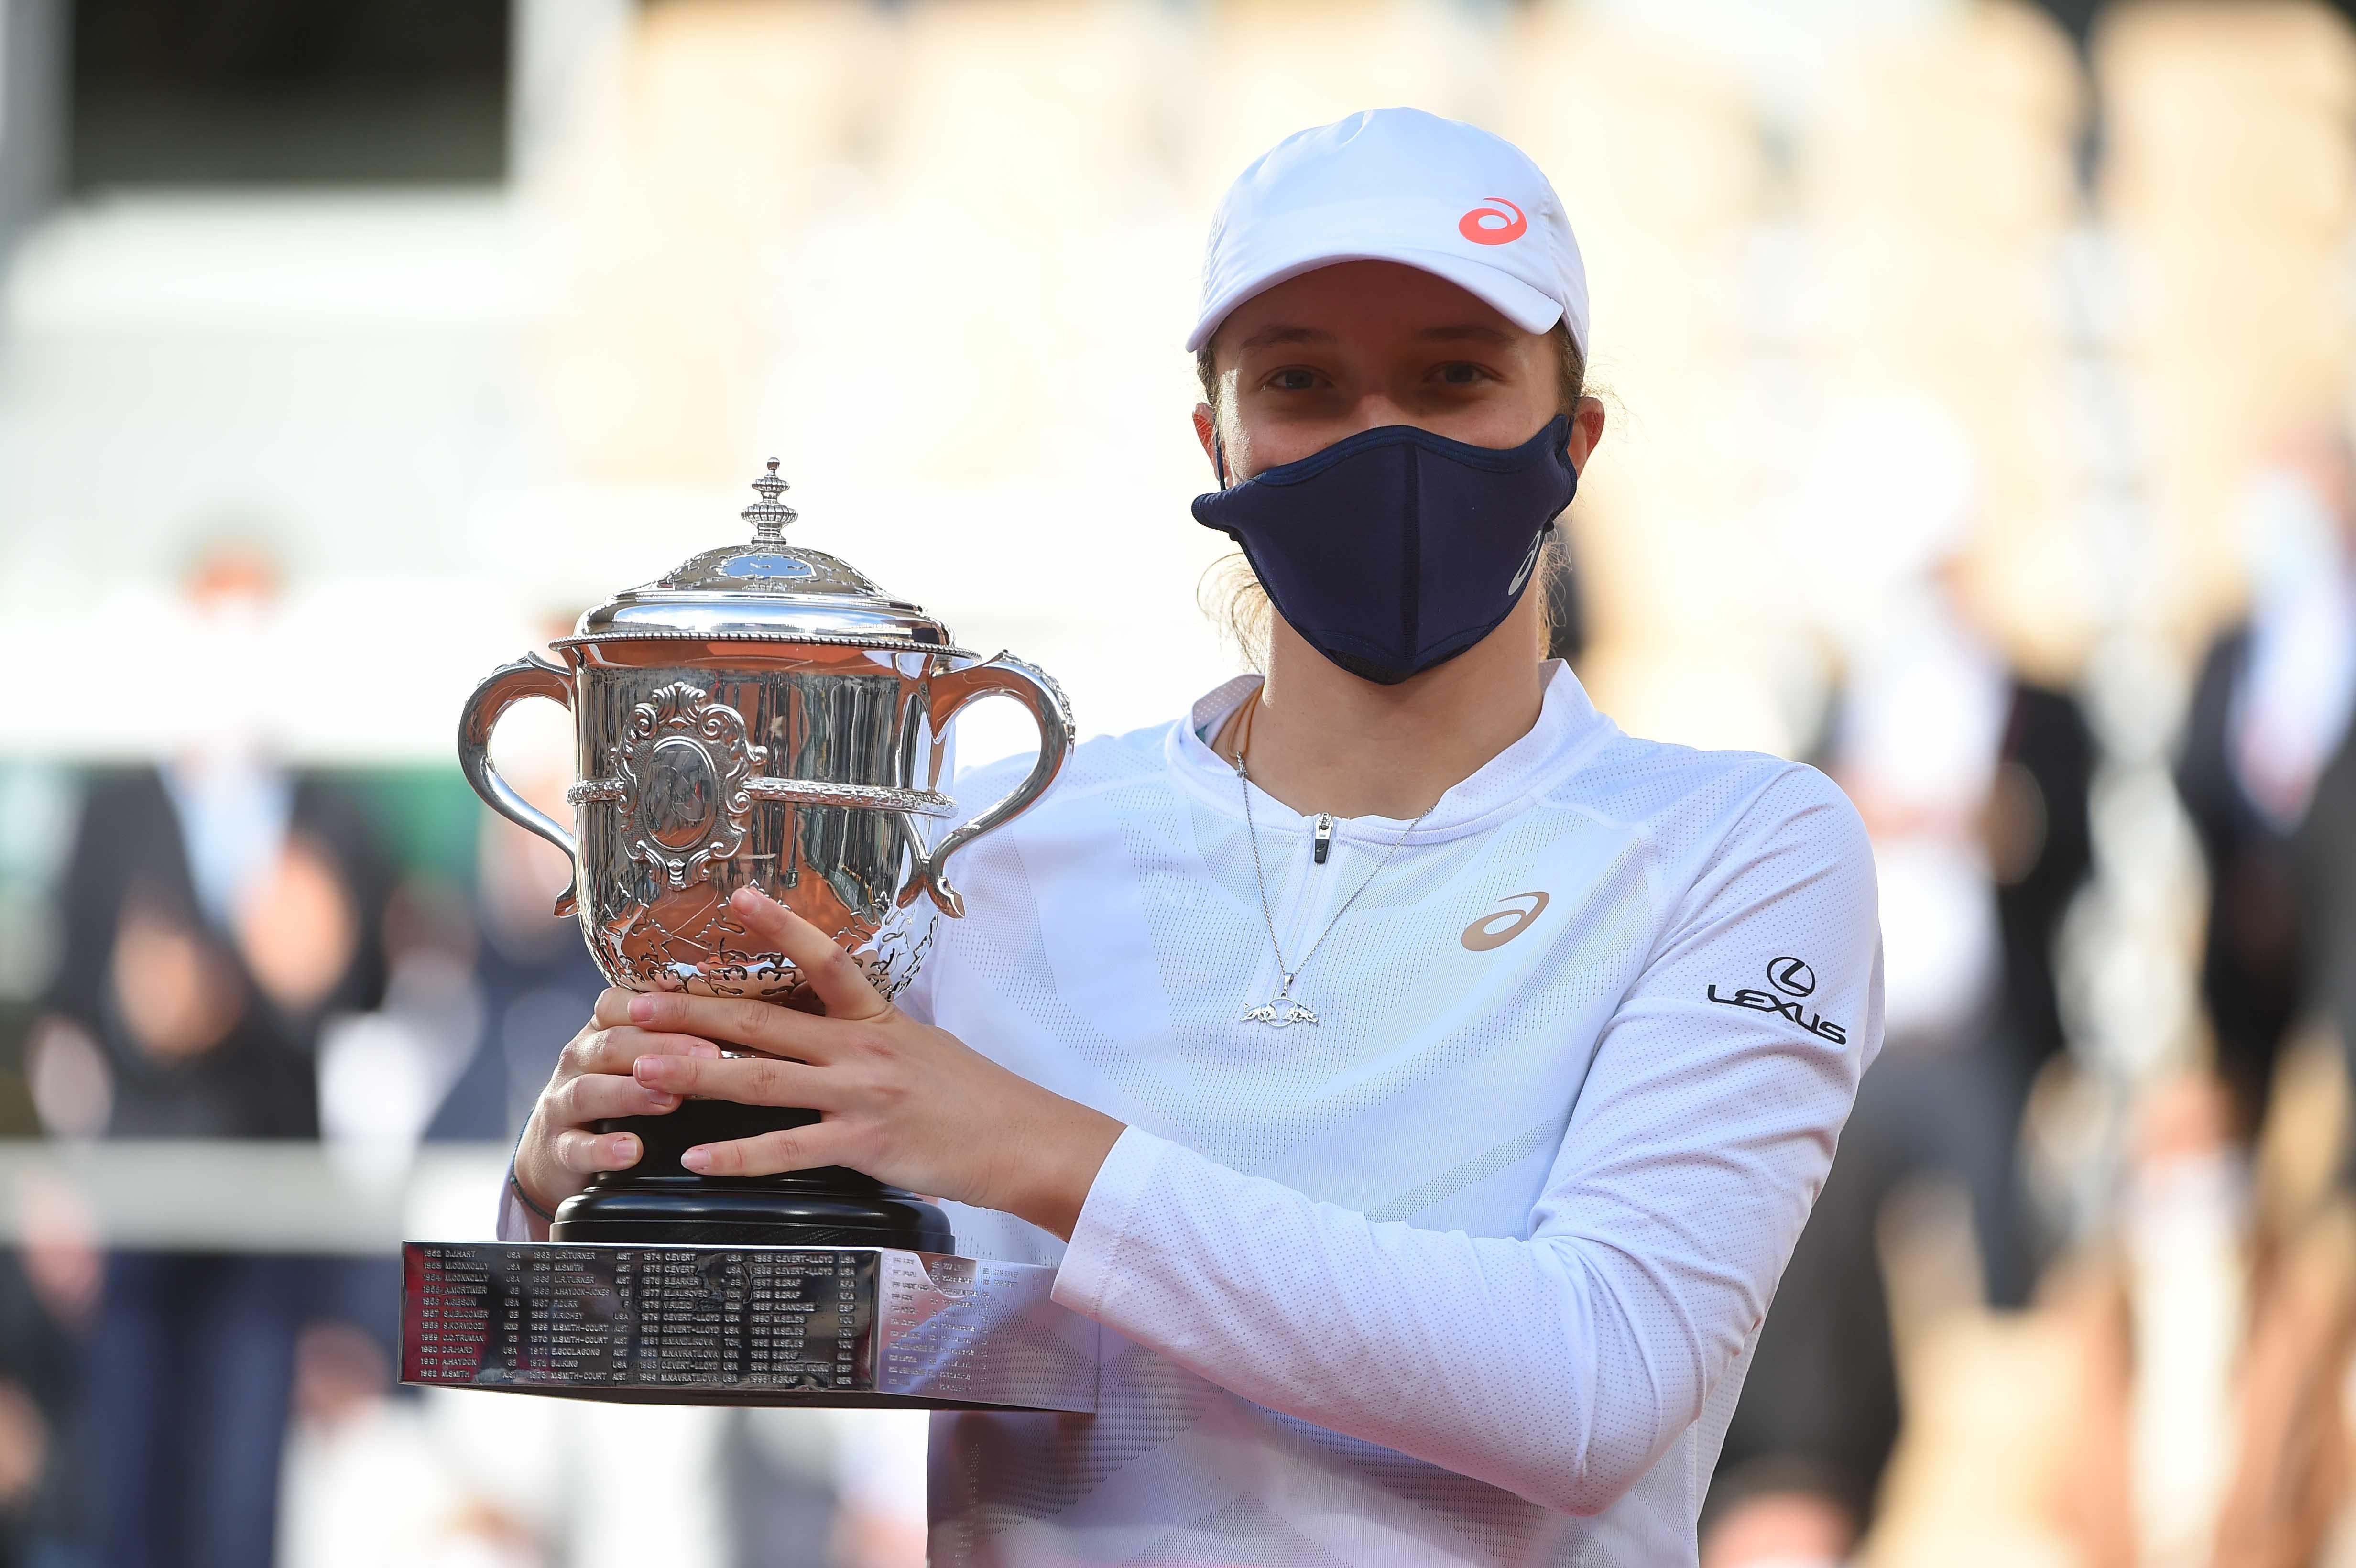 Iga Swiatek posing with her trophy at Roland-Garros 2020